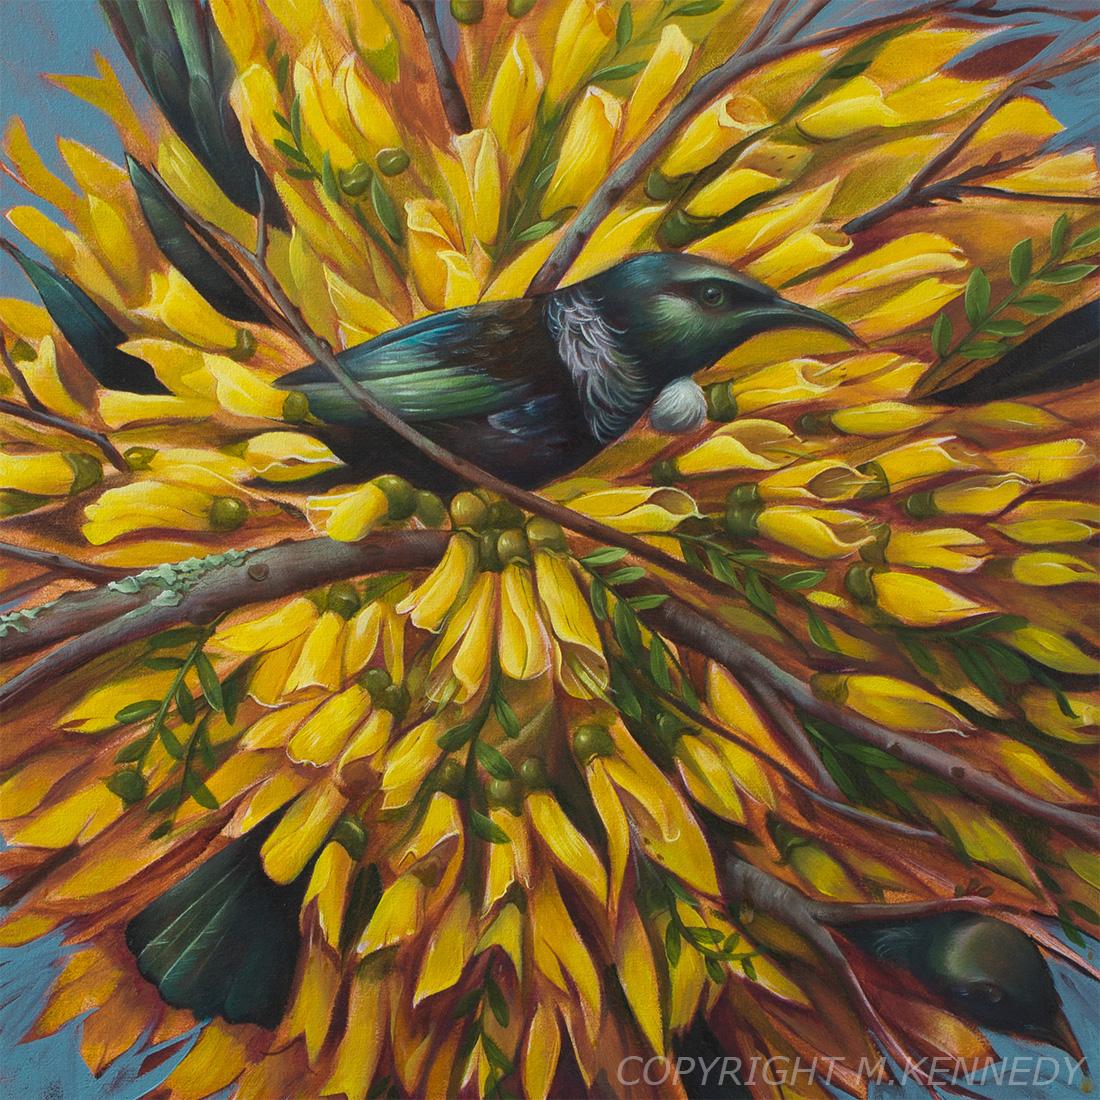 Tui kowhai New Zealand Nature Oil Painting painting   traditional pop surrealsim ILLUSTRATION